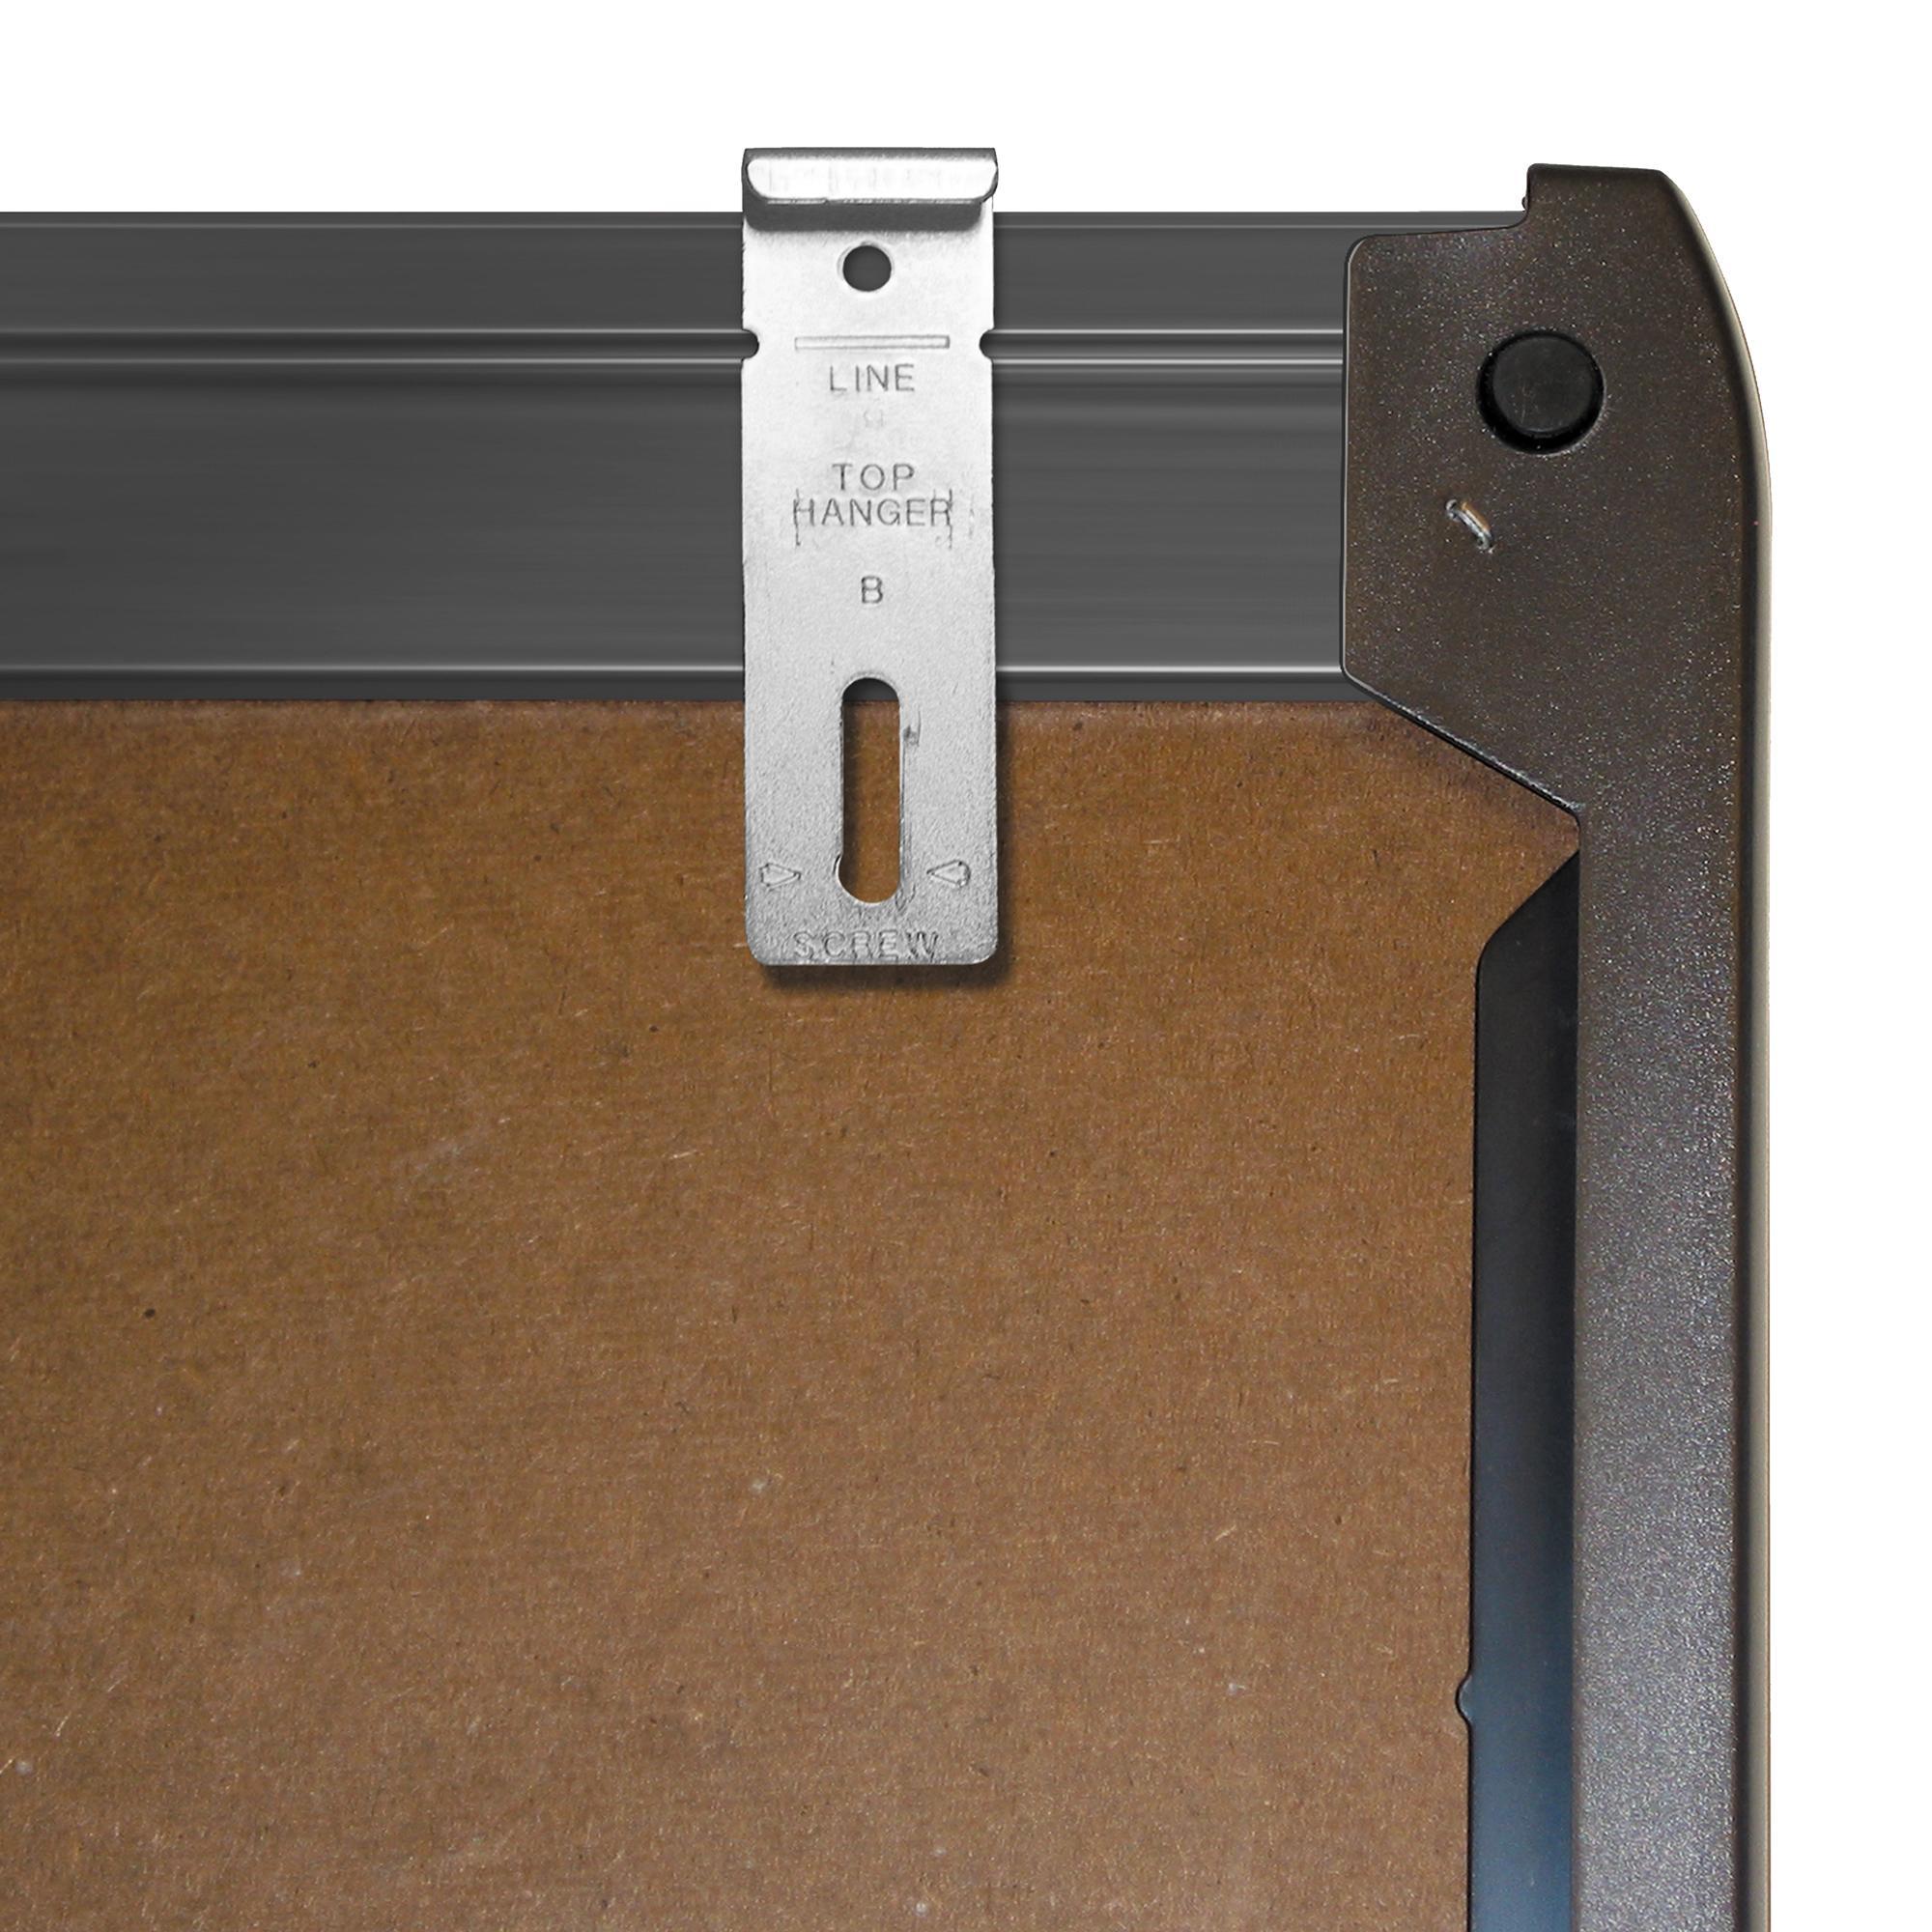 Amazon.com : Quartet Prestige Total Erase Whiteboard